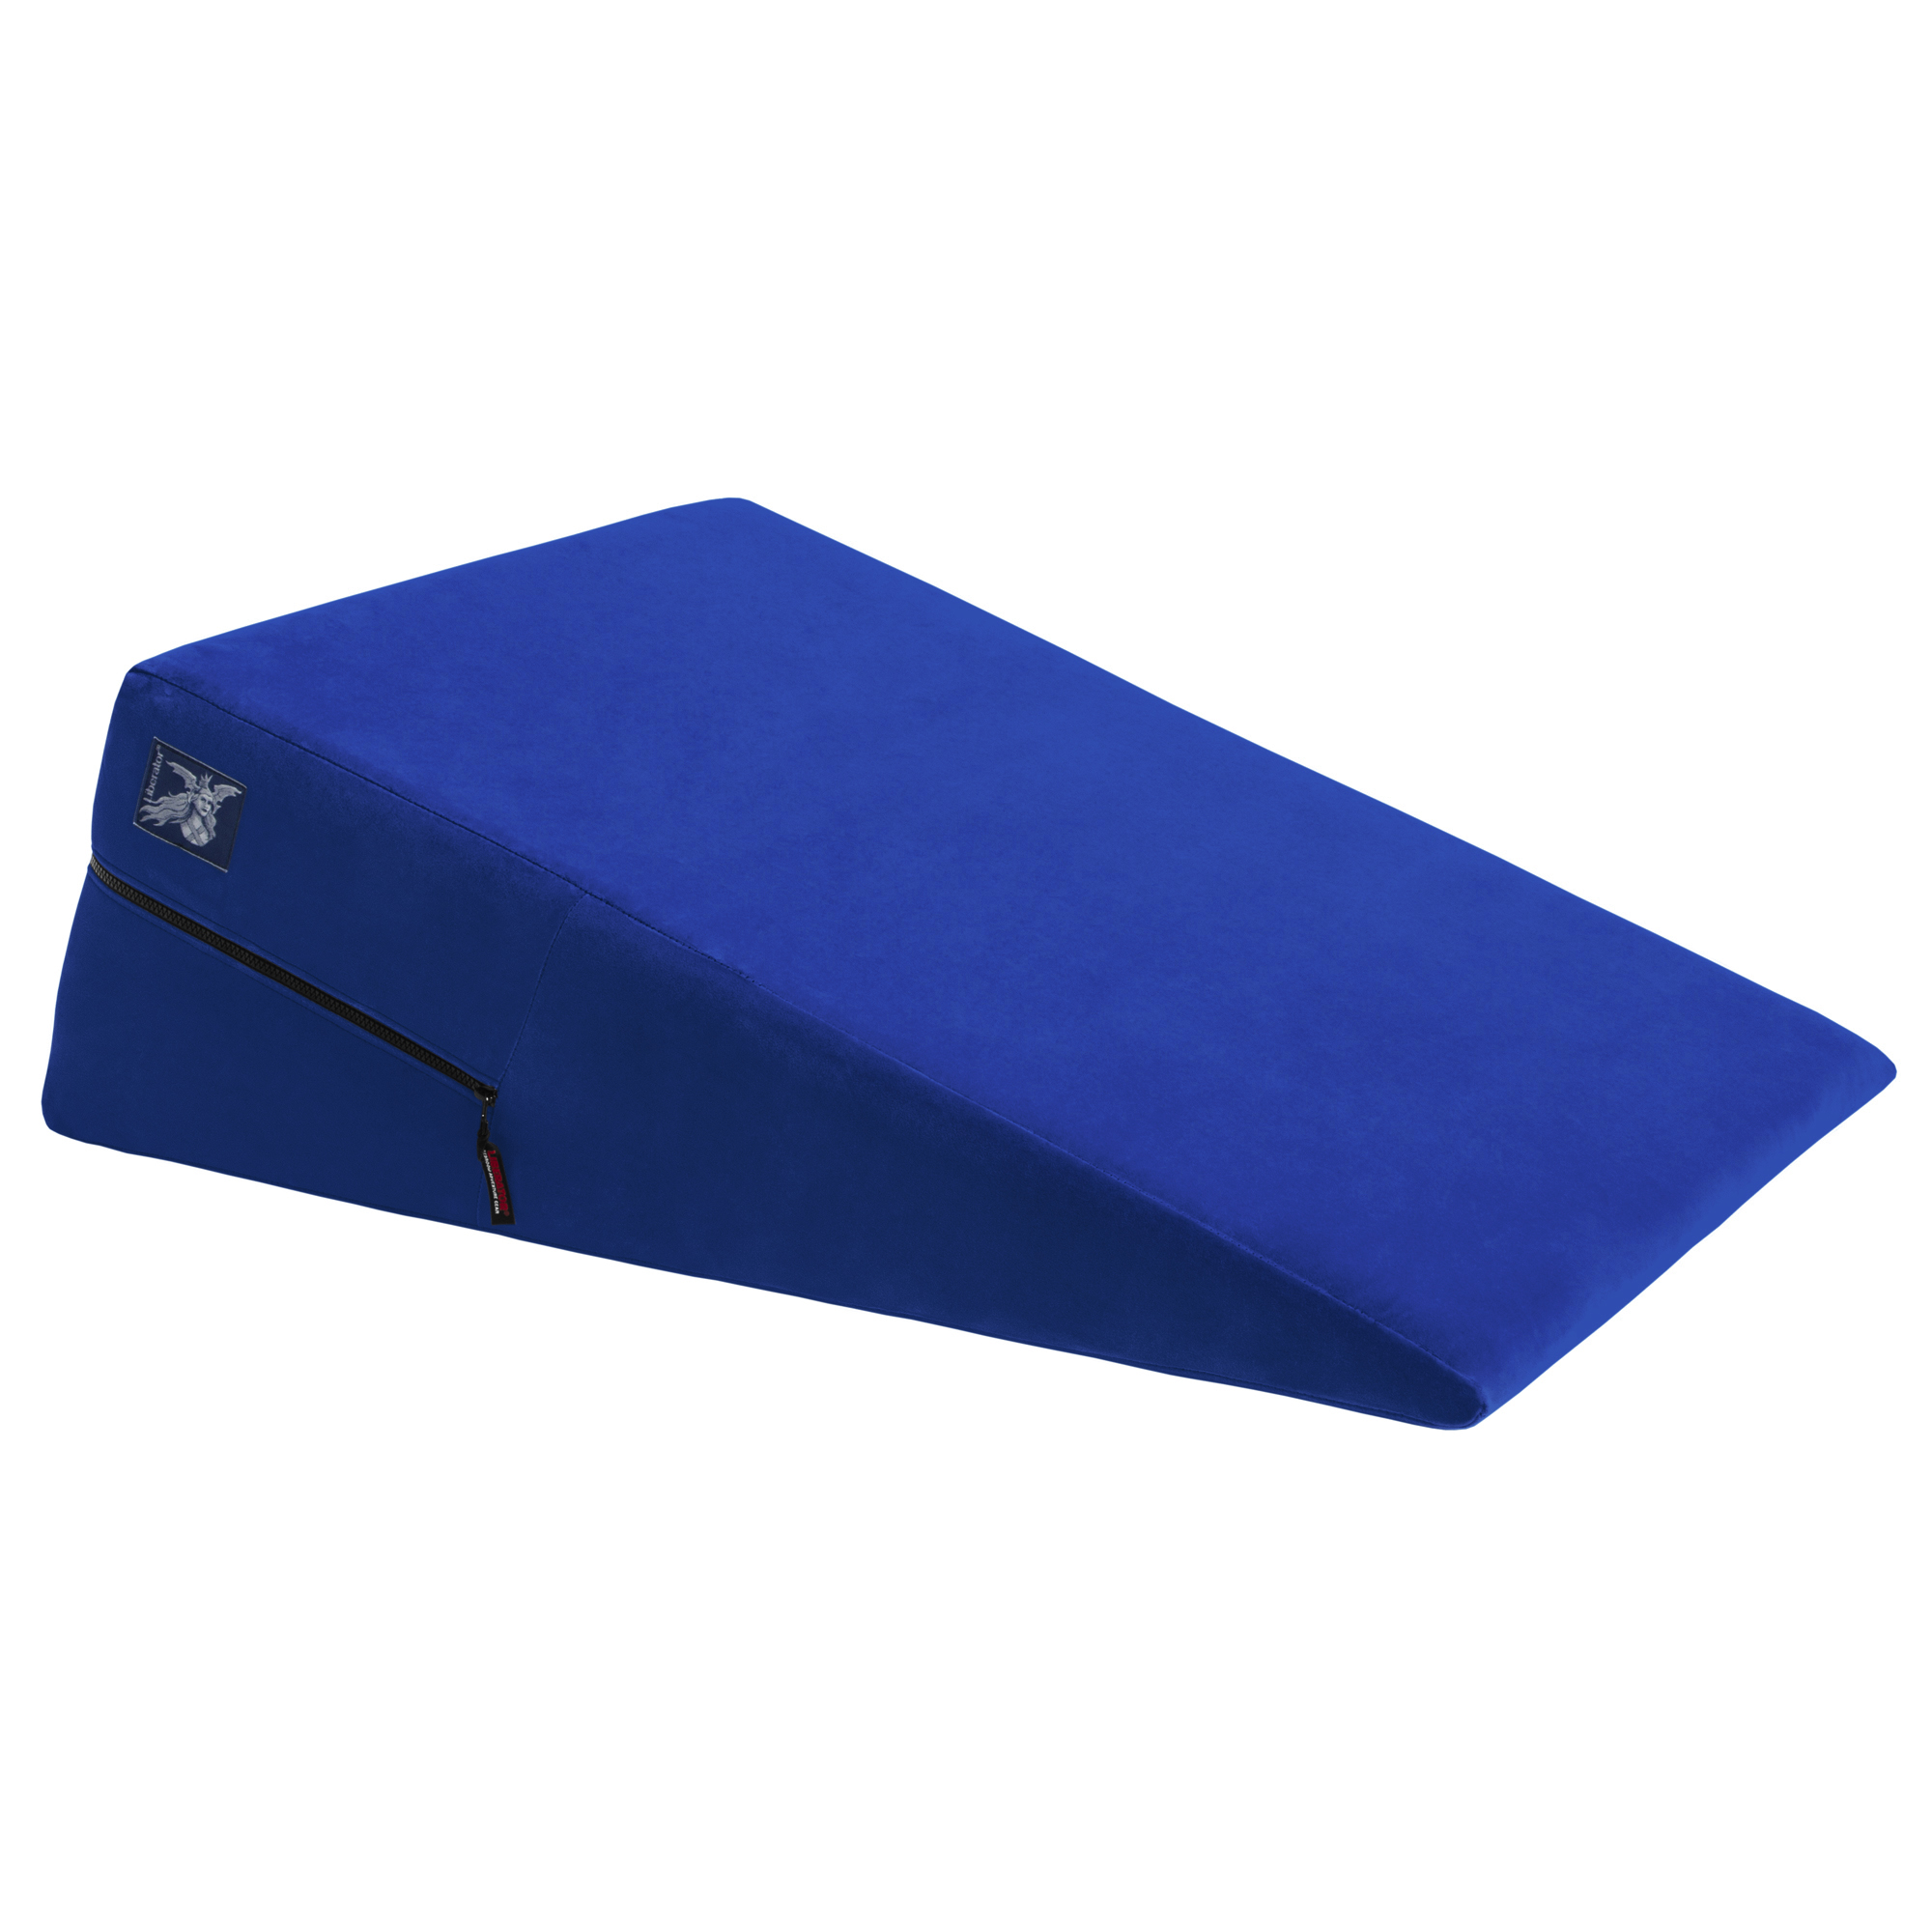 ramp_blue1